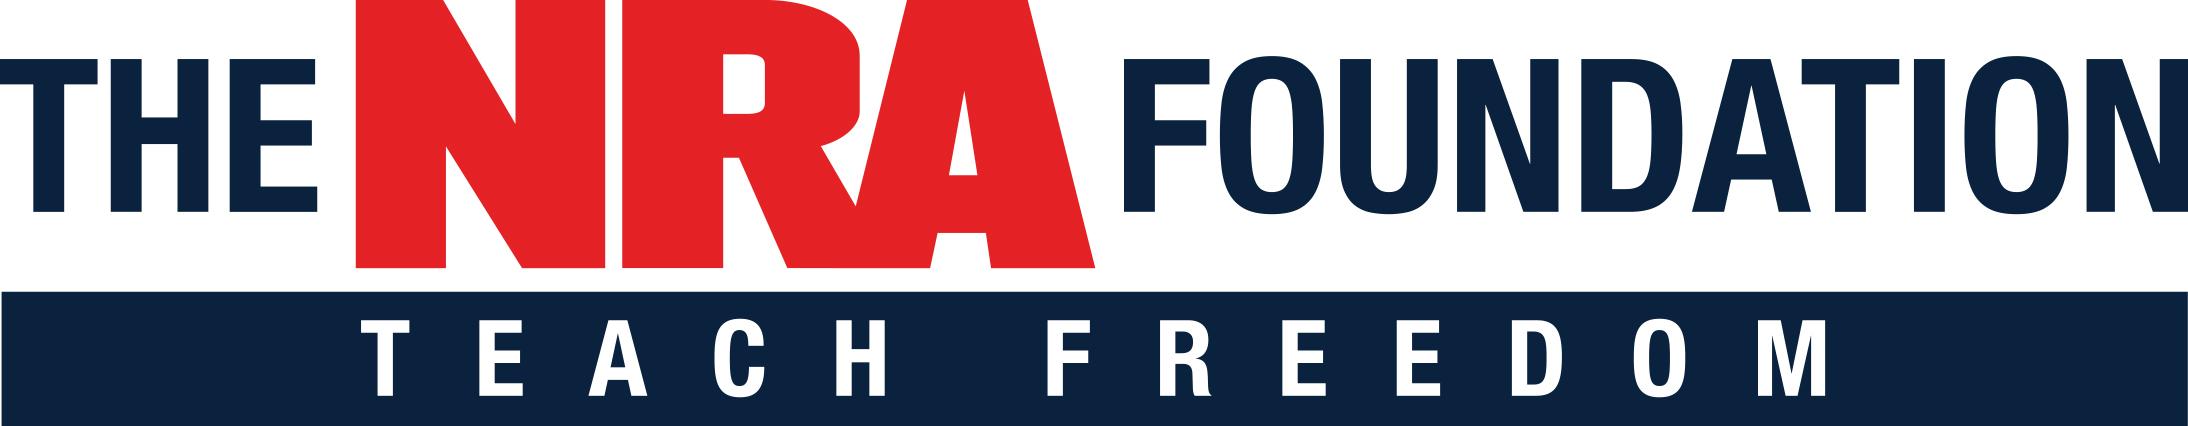 NRA Foundation Logo.jpg